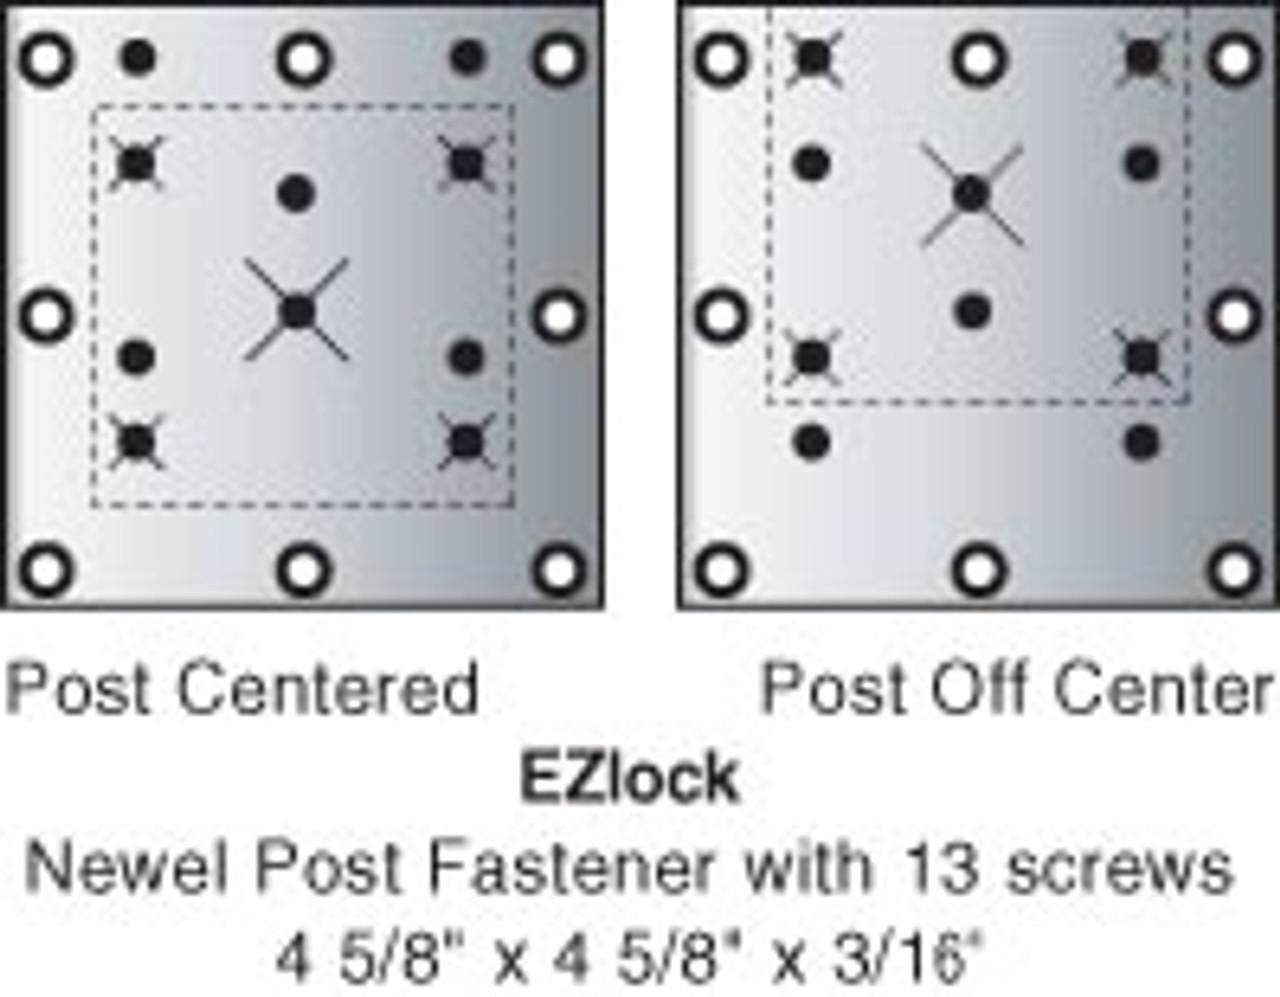 EZLock Newel Fastener